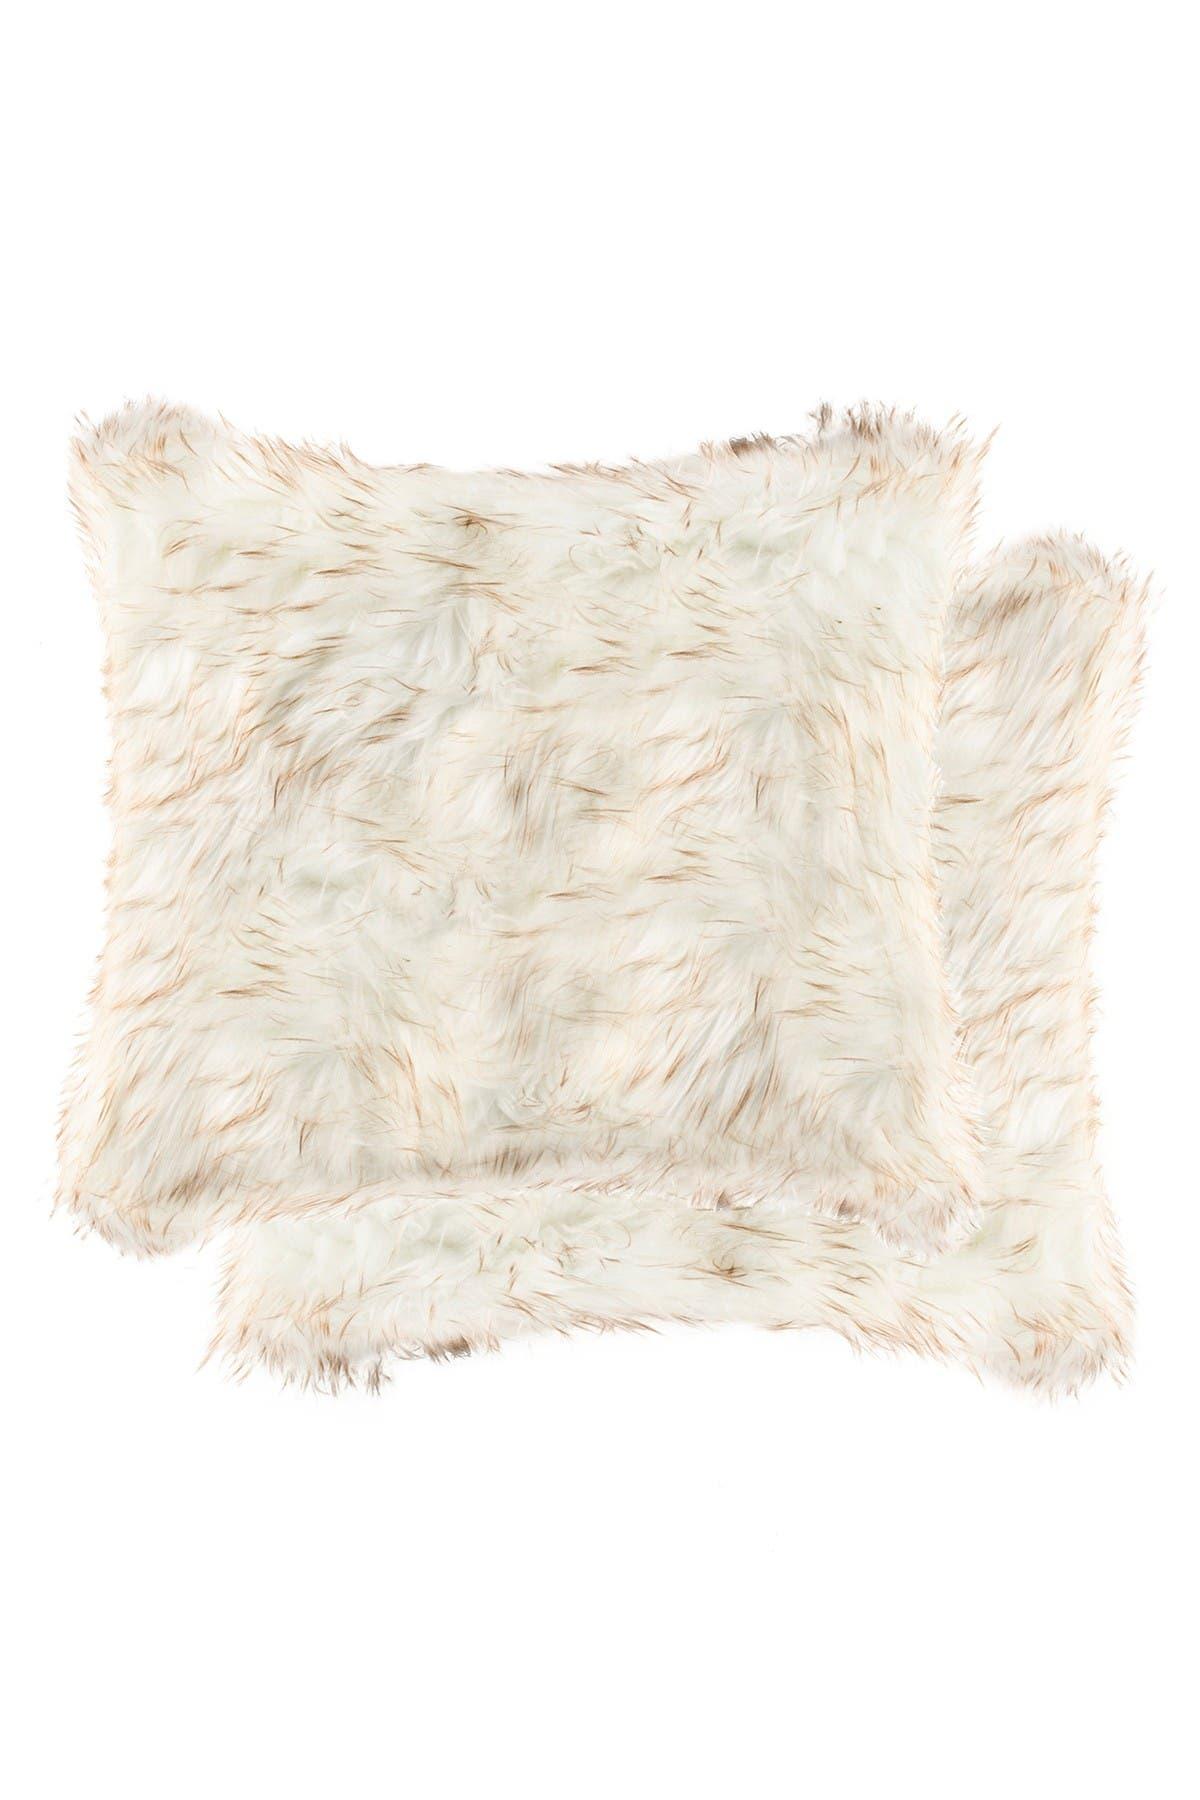 "Image of LUXE Belton Faux Fur Pillow - Set of 2 - 18"" x 18"" - Gradient Tan"